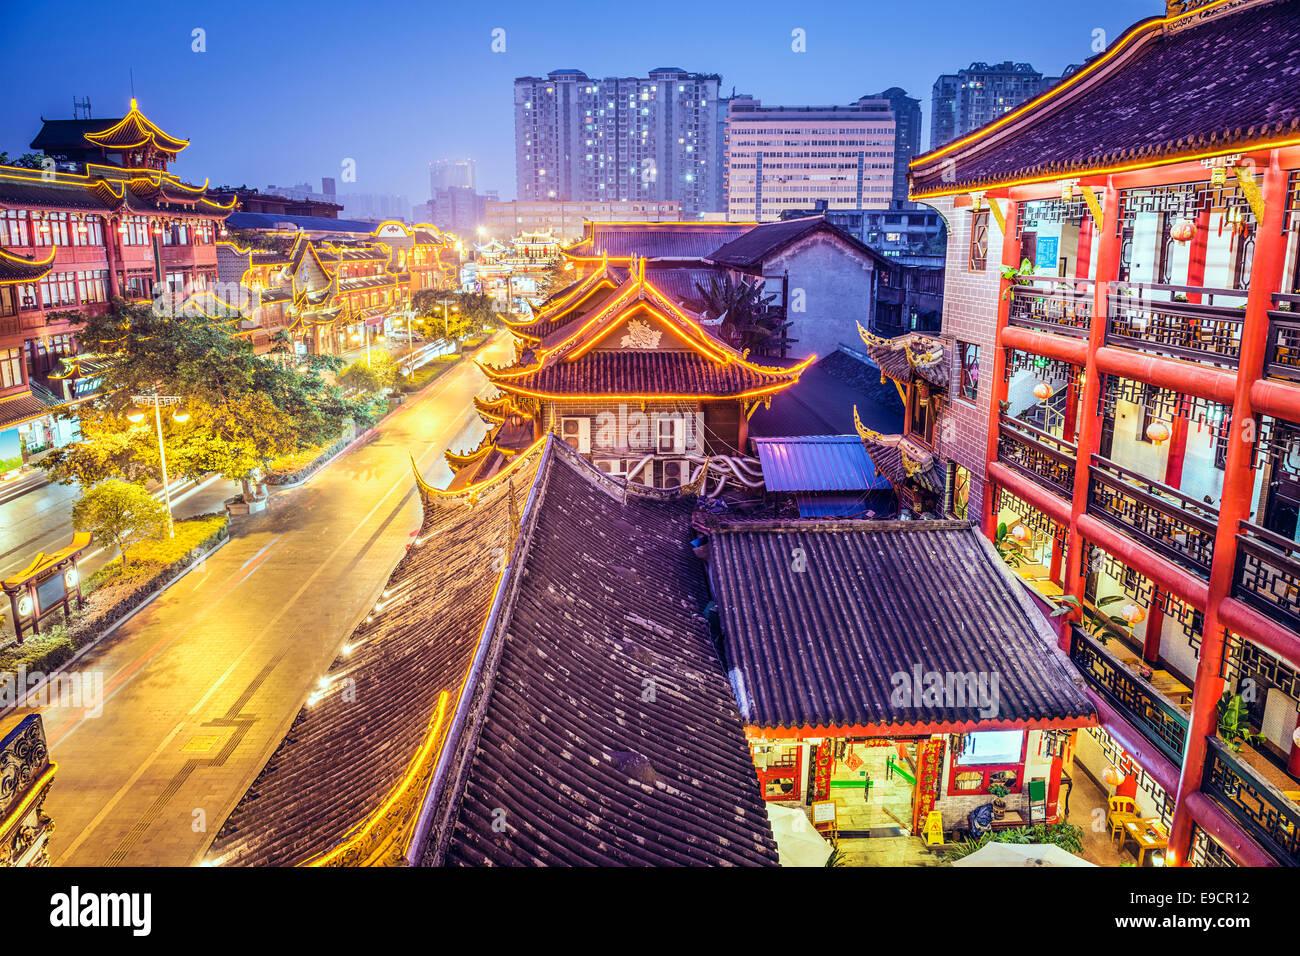 Chengdu, China cityscape above Qintai Road. - Stock Image